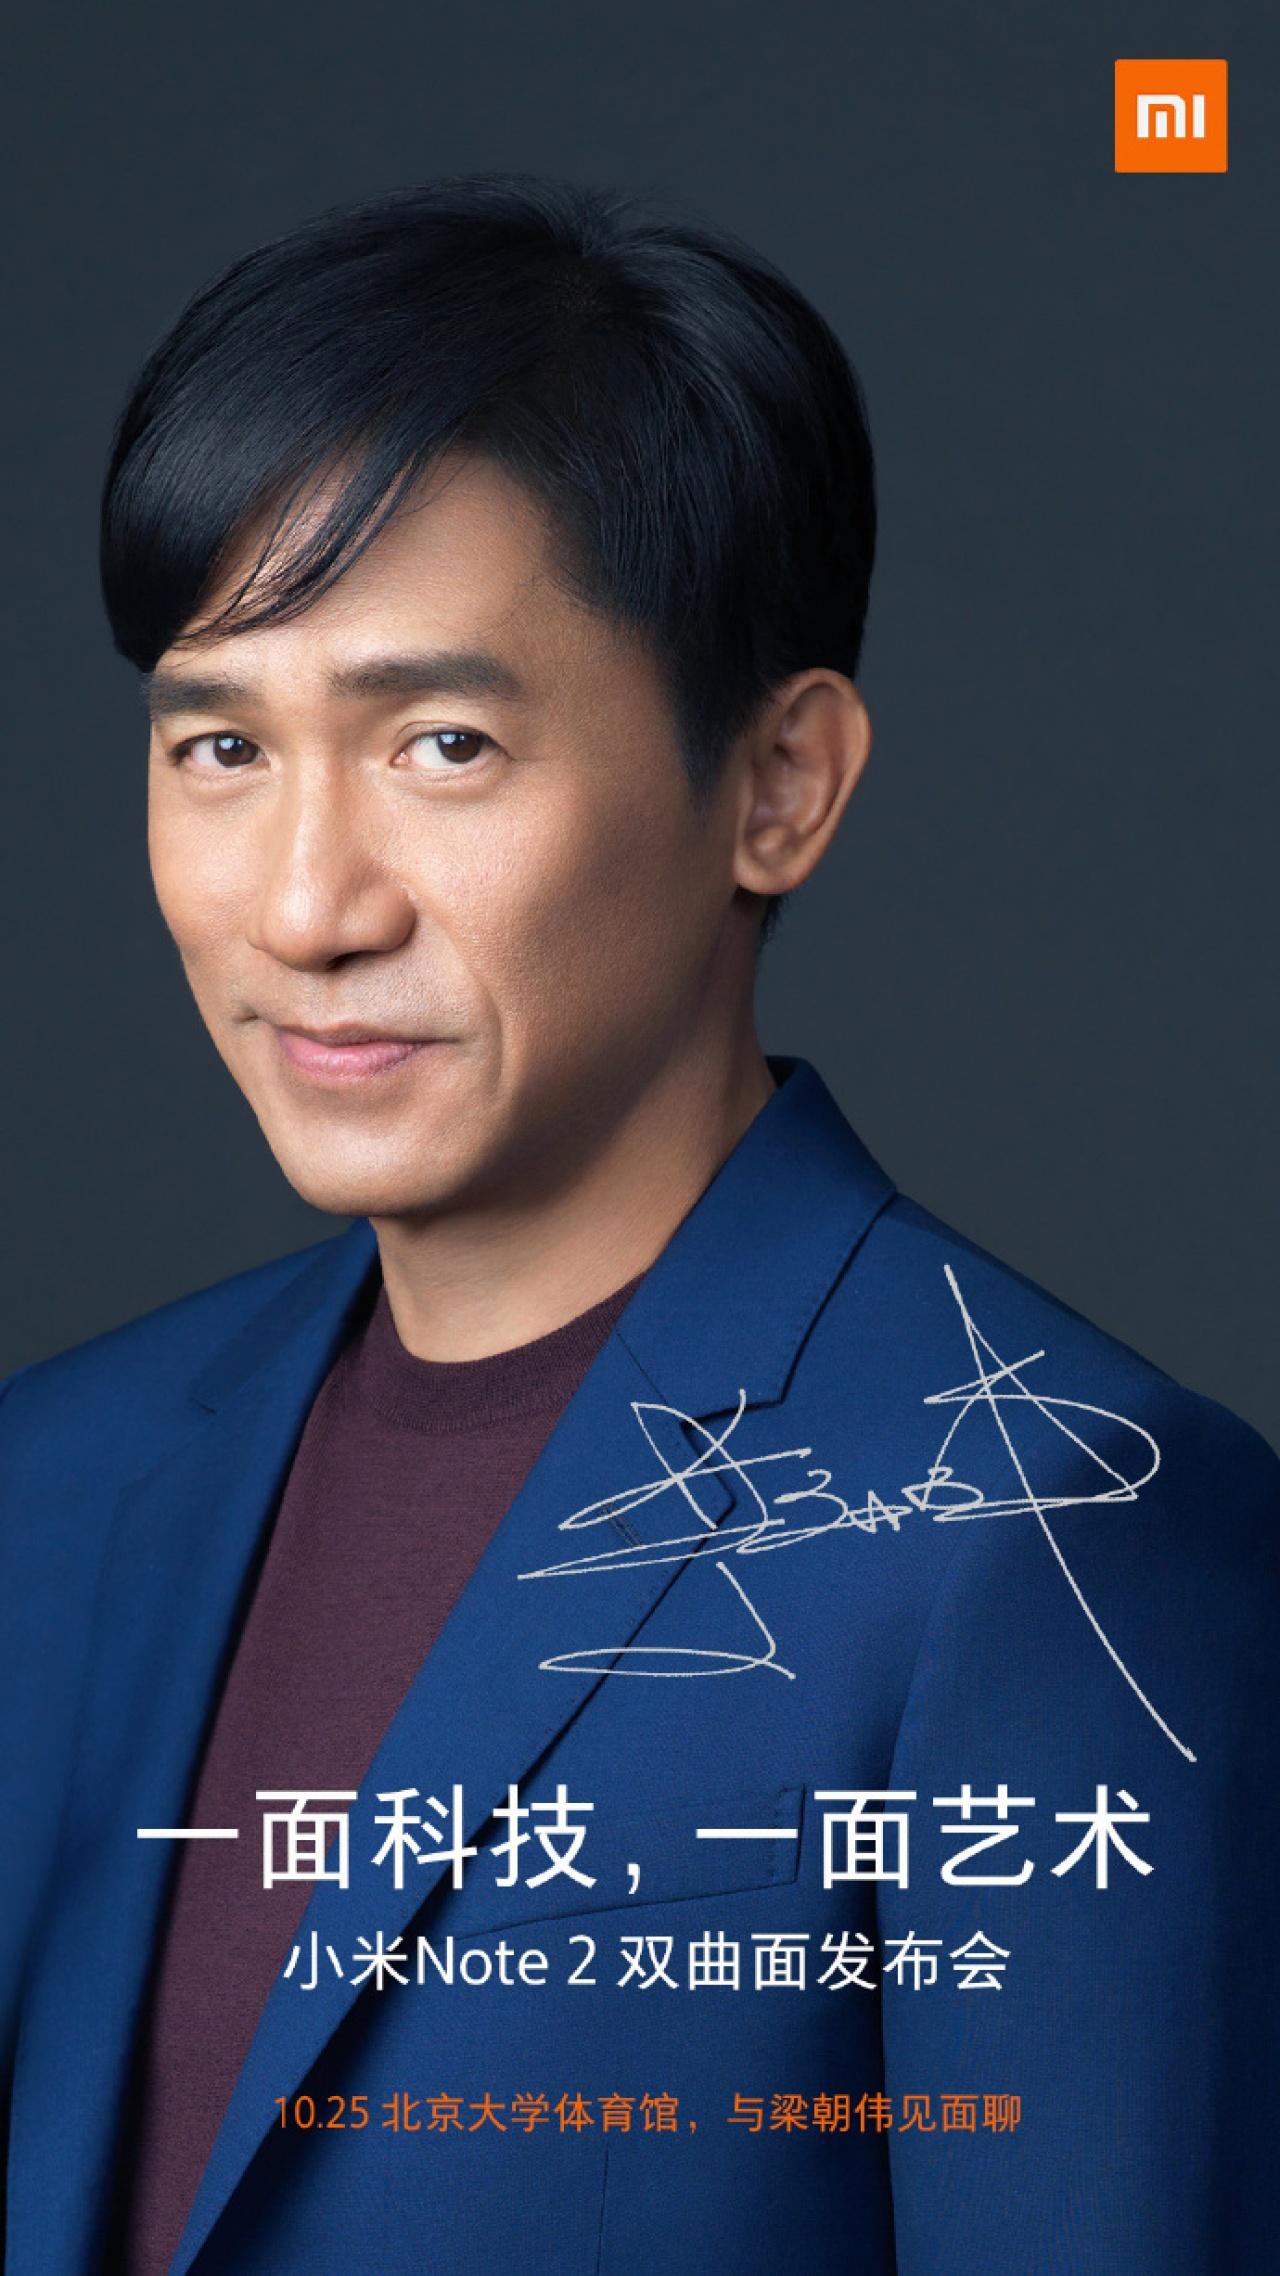 xiaomi-note2-teaser-Tony-Leung